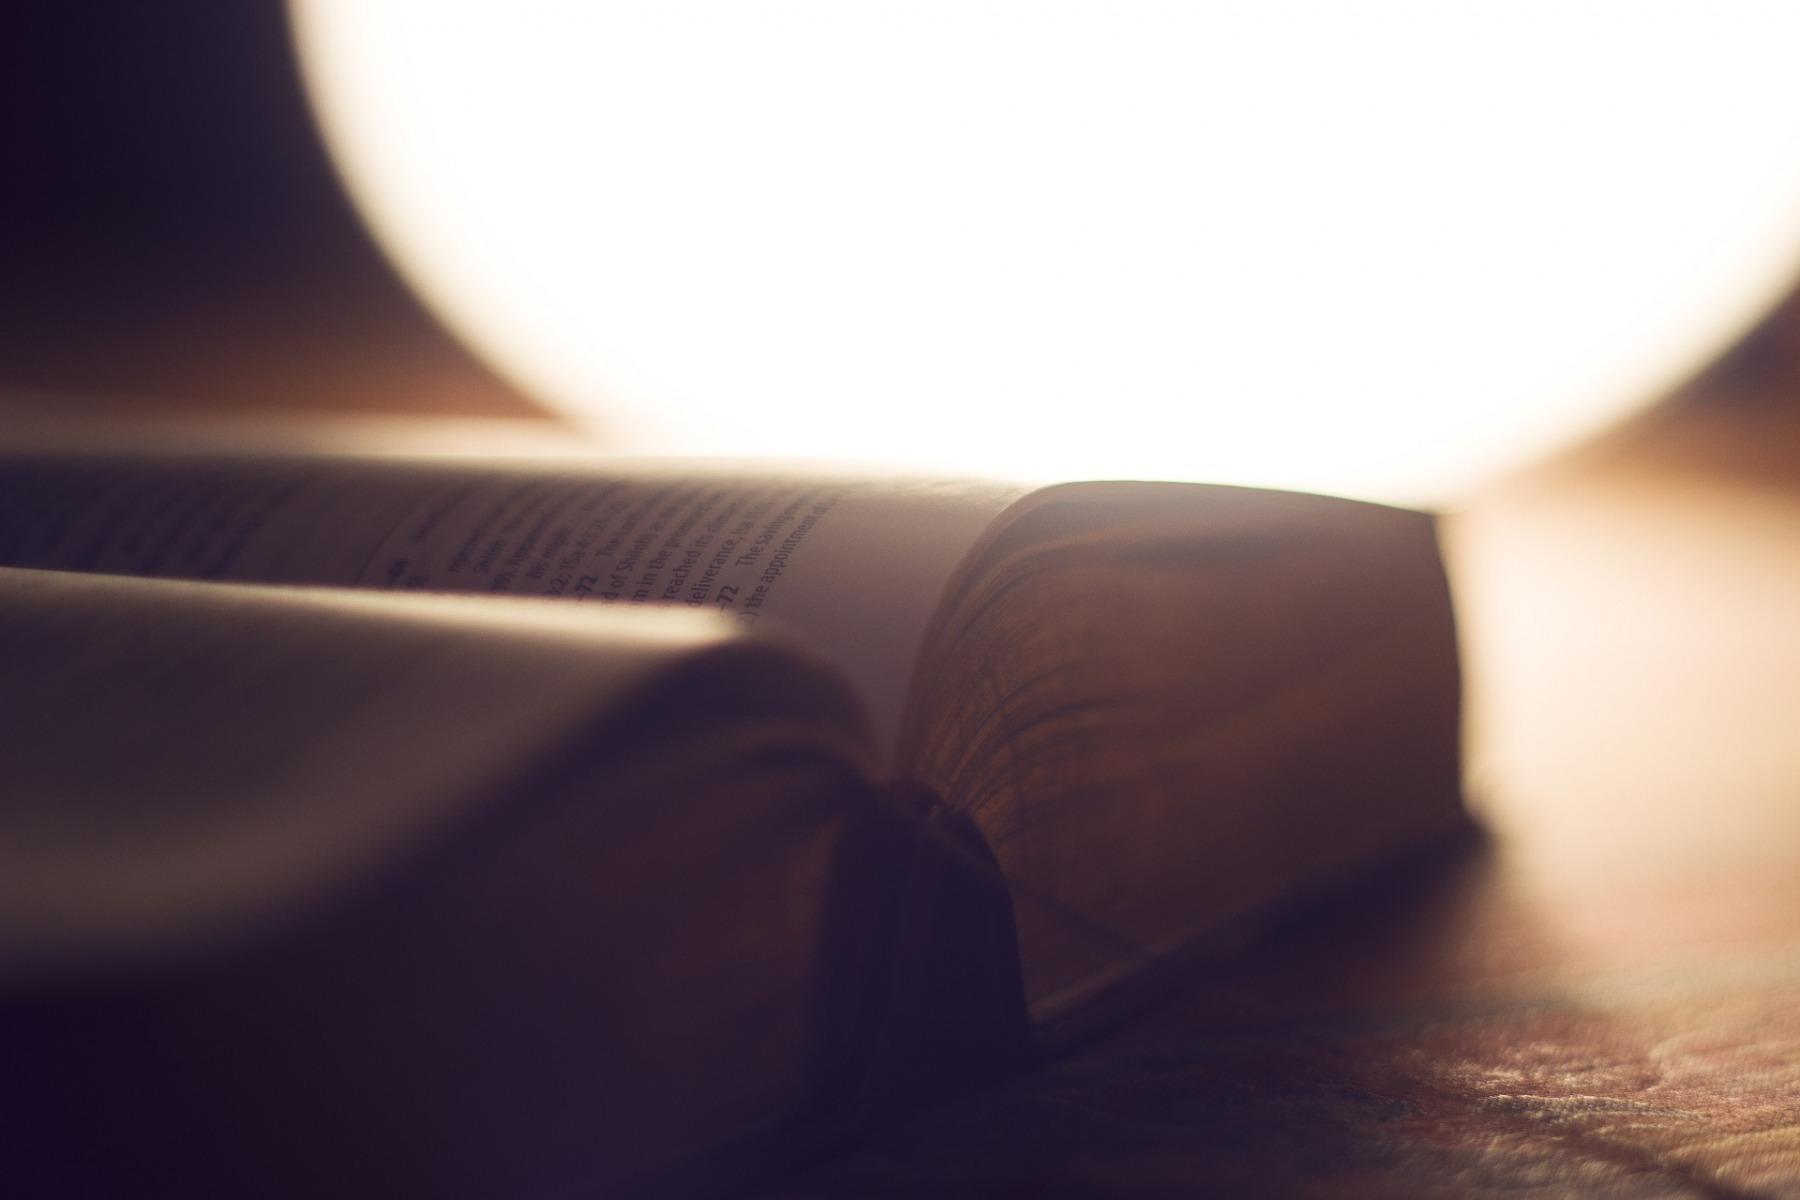 1_bible-1869164_1920